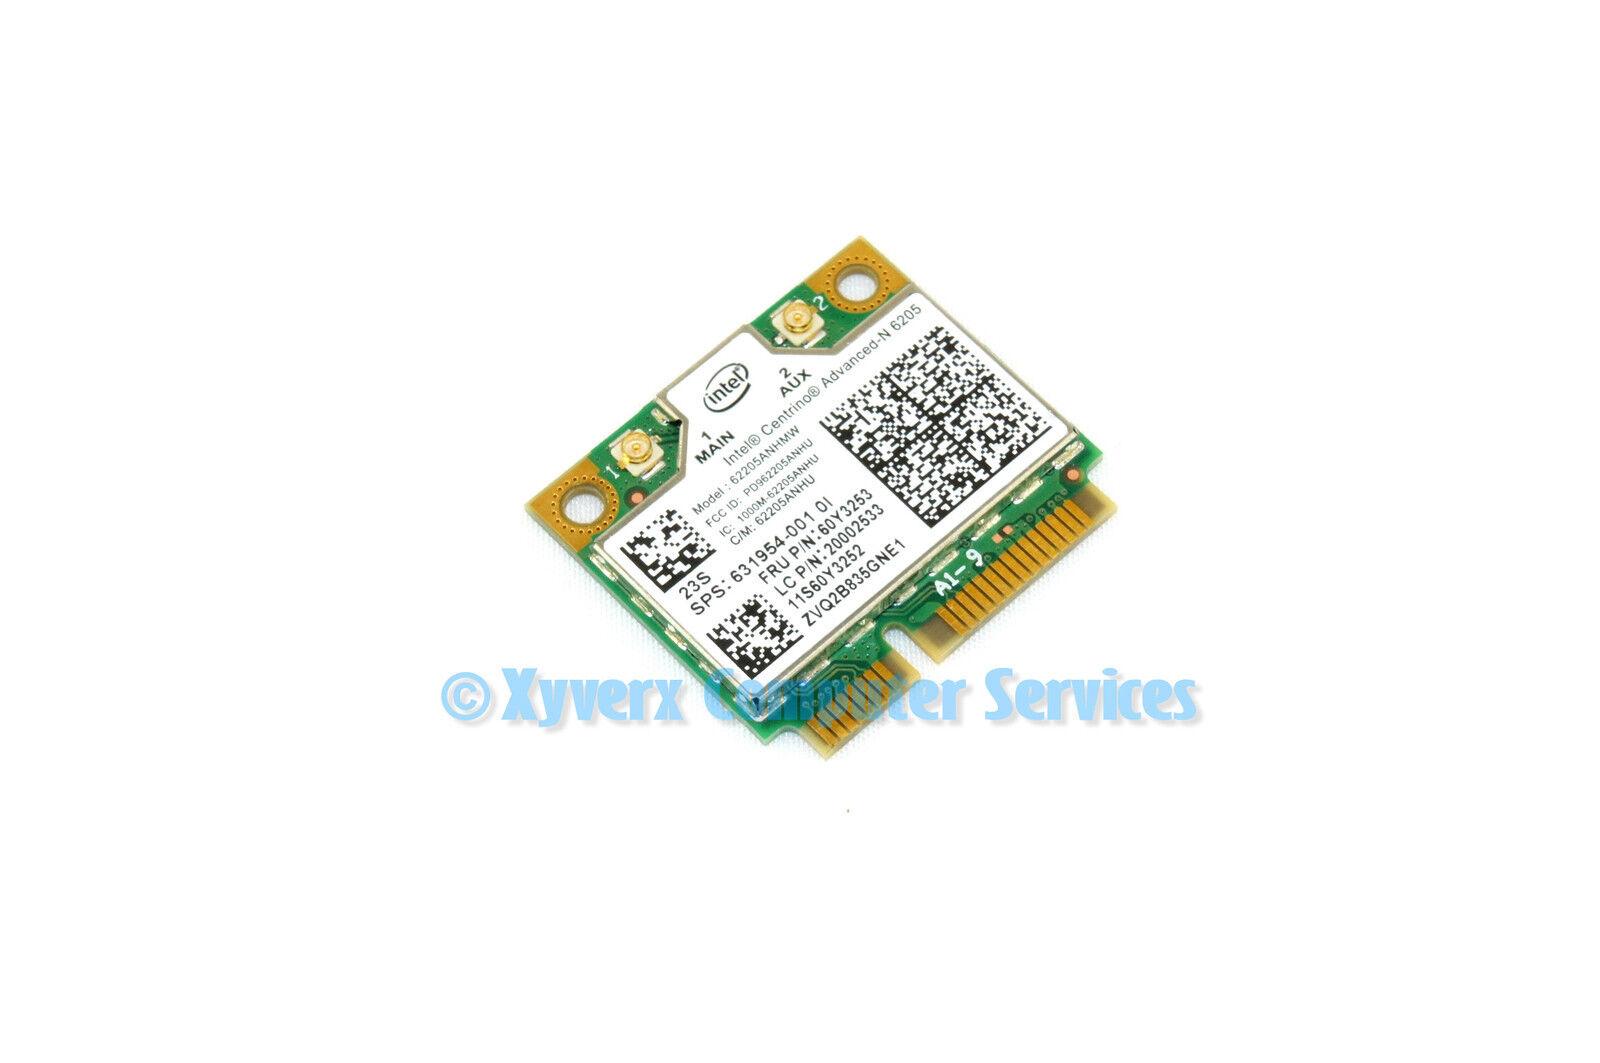 Lenovo T530 Genuine WiFi Card Mini Intel N6205 60y3253